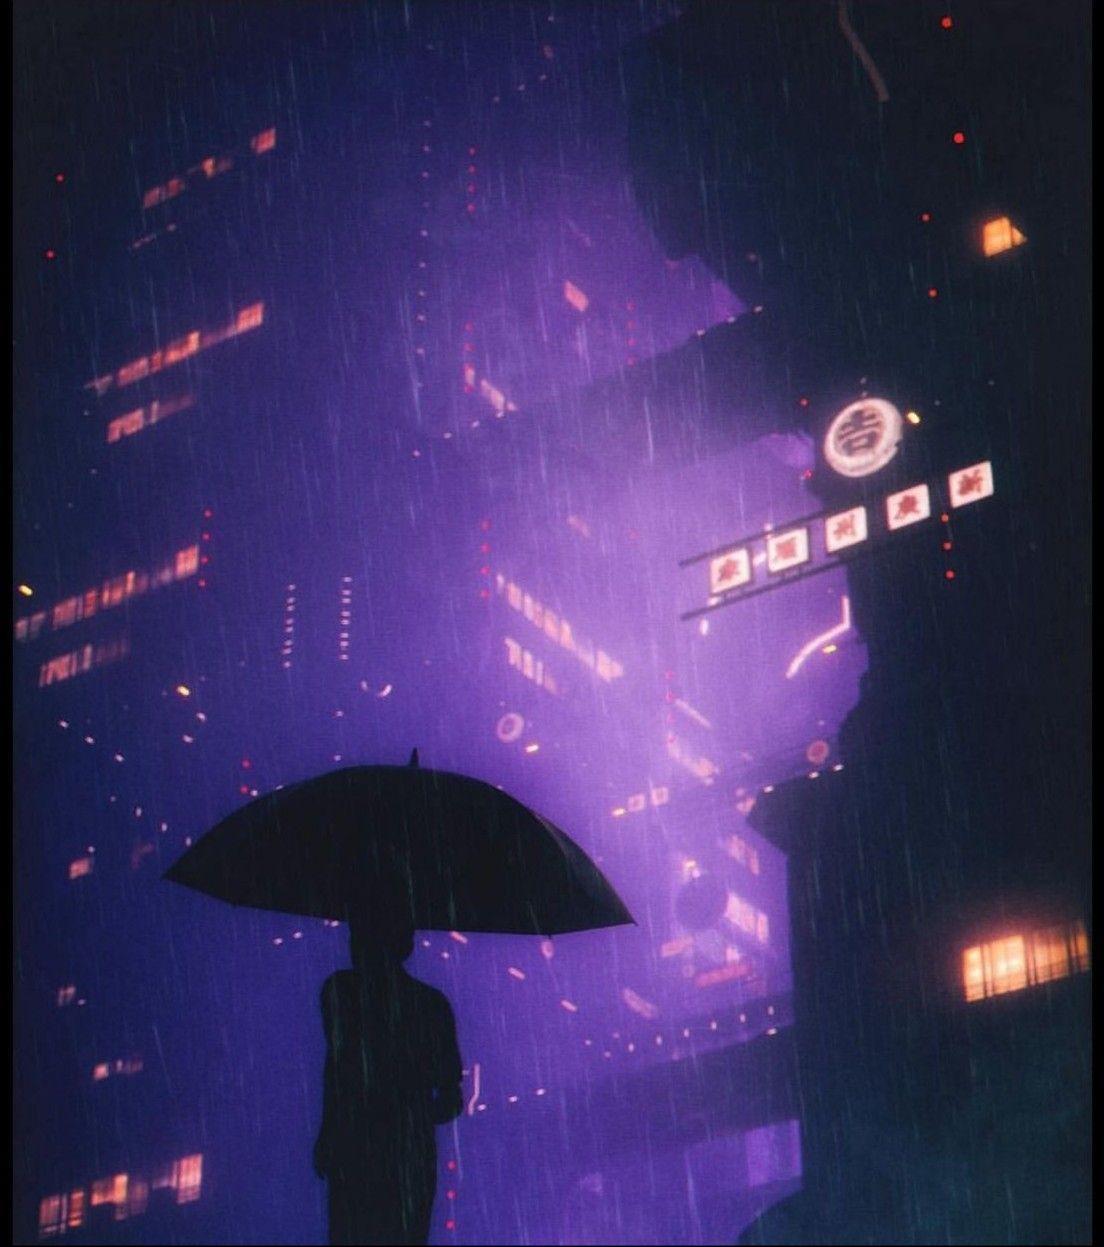 Pin by Hugo Hernandez on Cyber pun Rain wallpapers